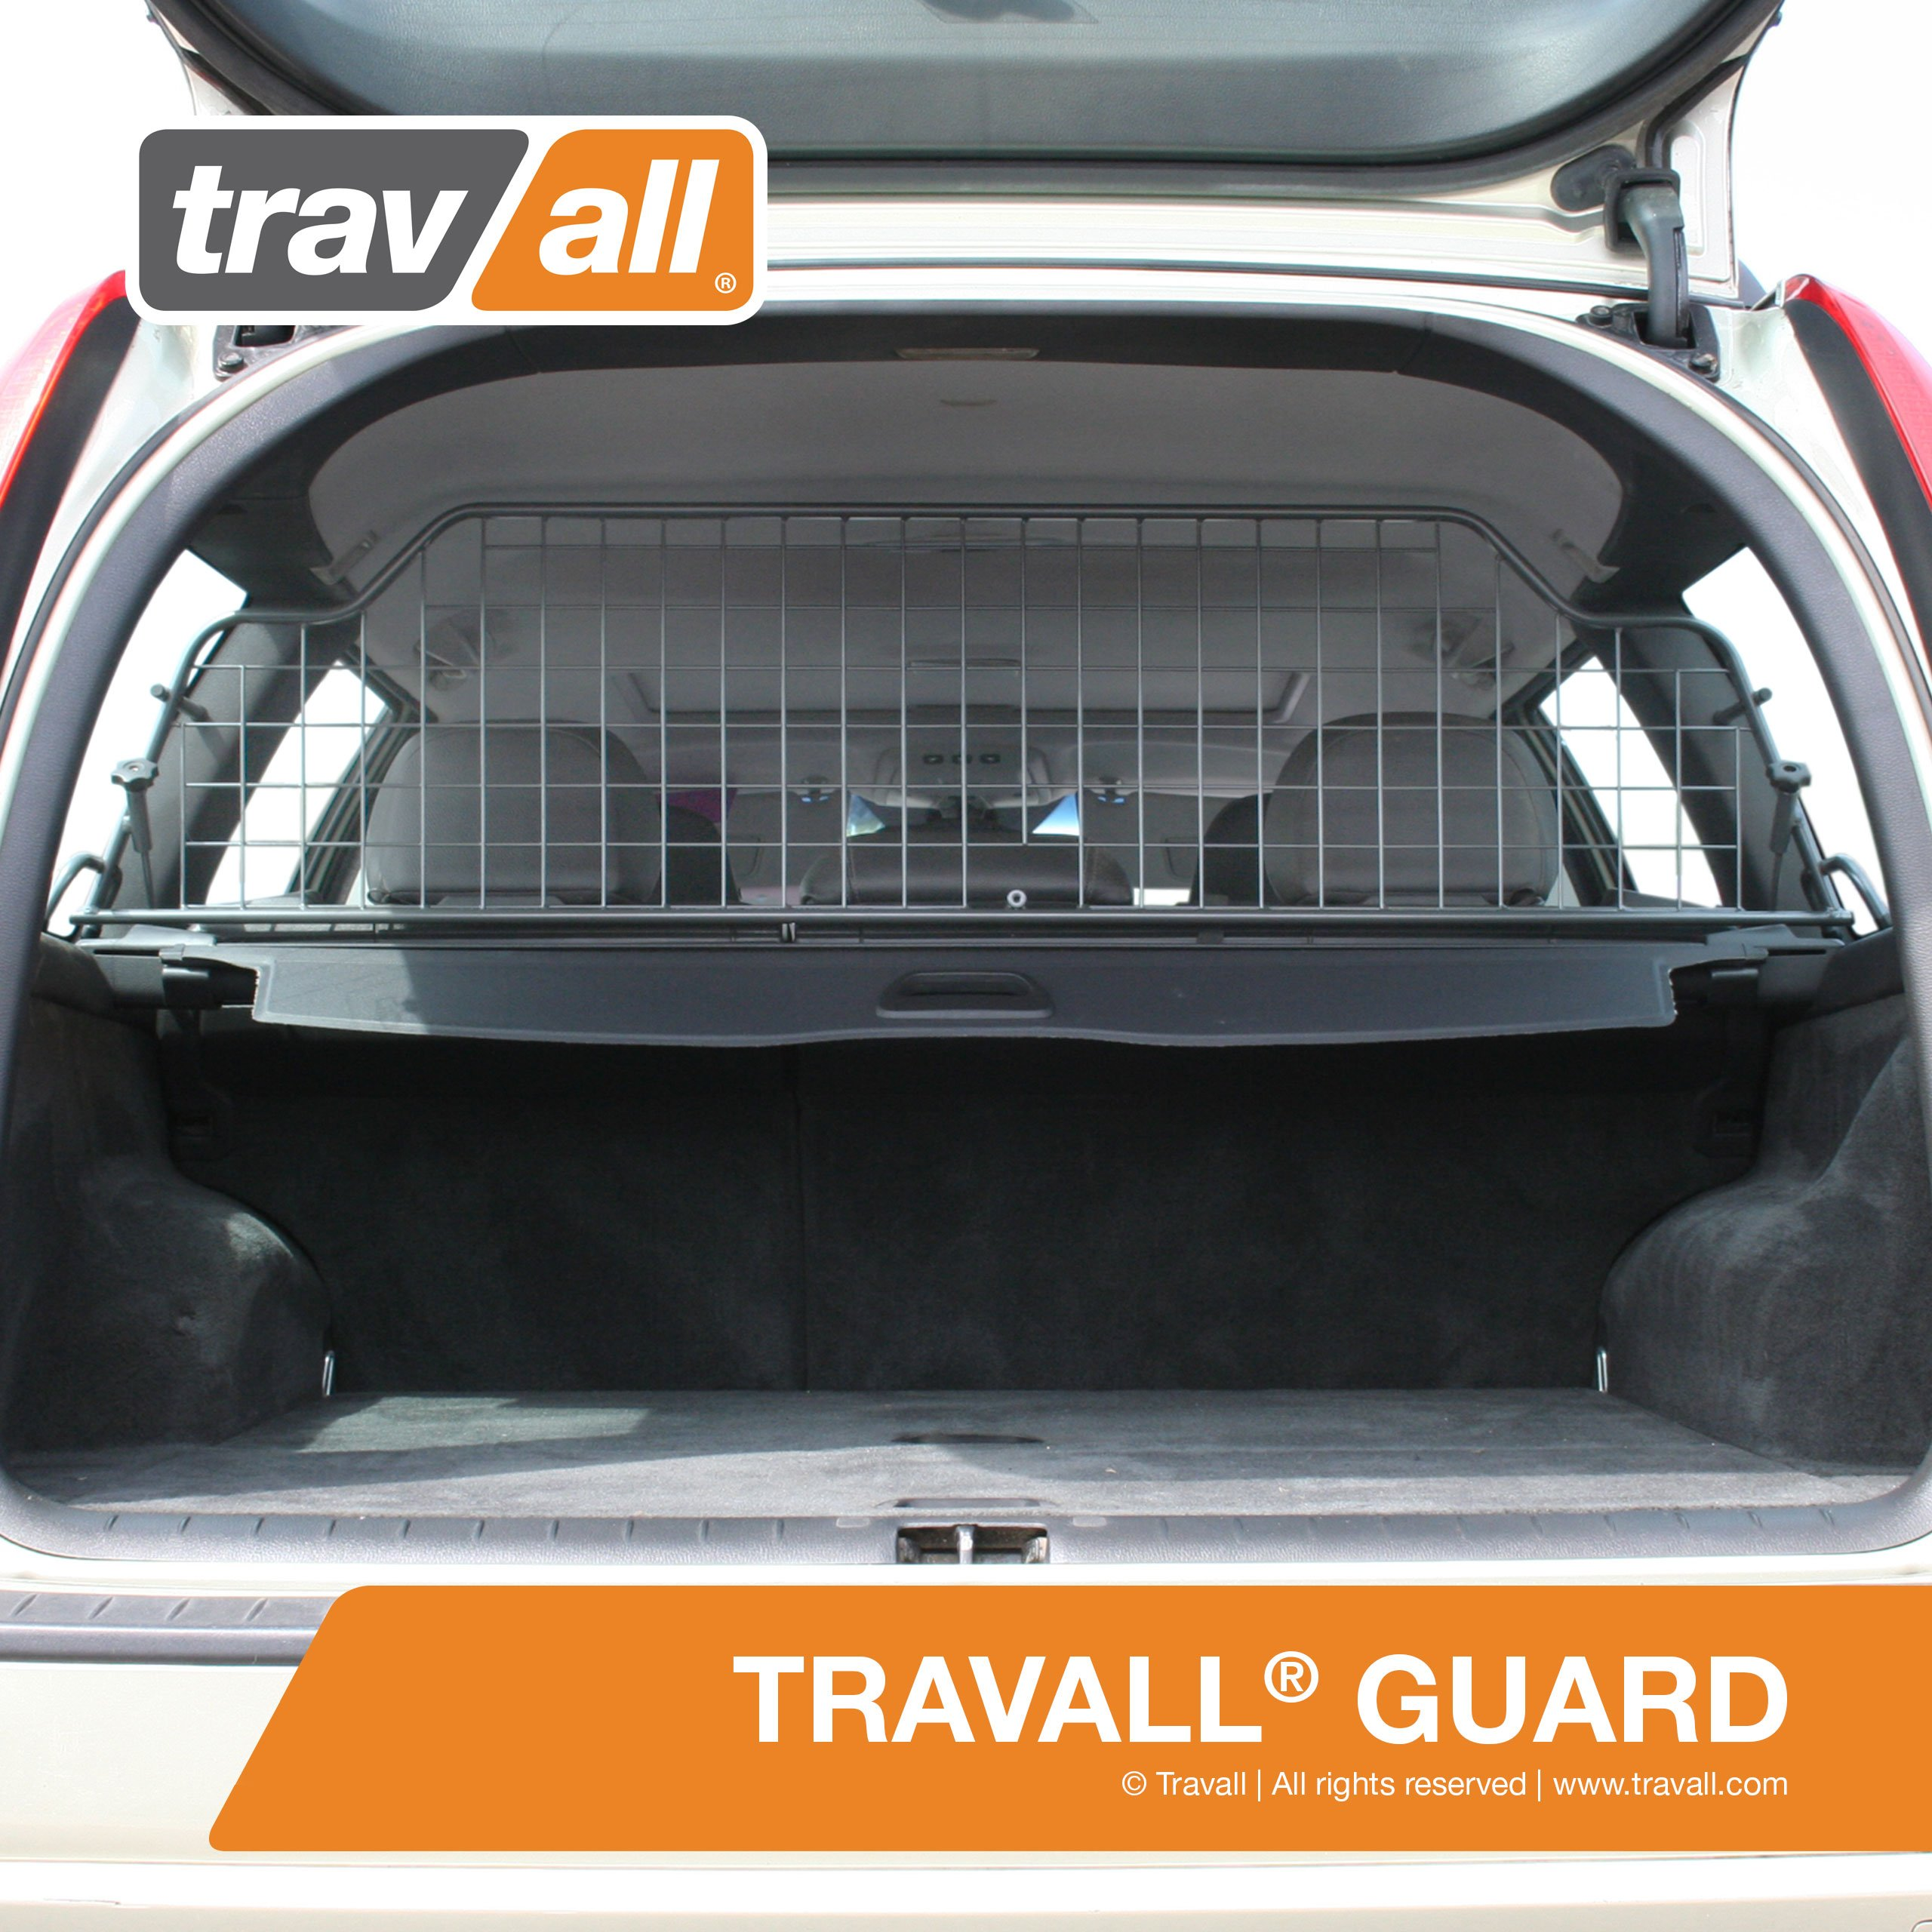 VOLVO XC70 V70 Estate Pet Barrier (2000-2007) Original Travall Guard TDG1242 by Travall